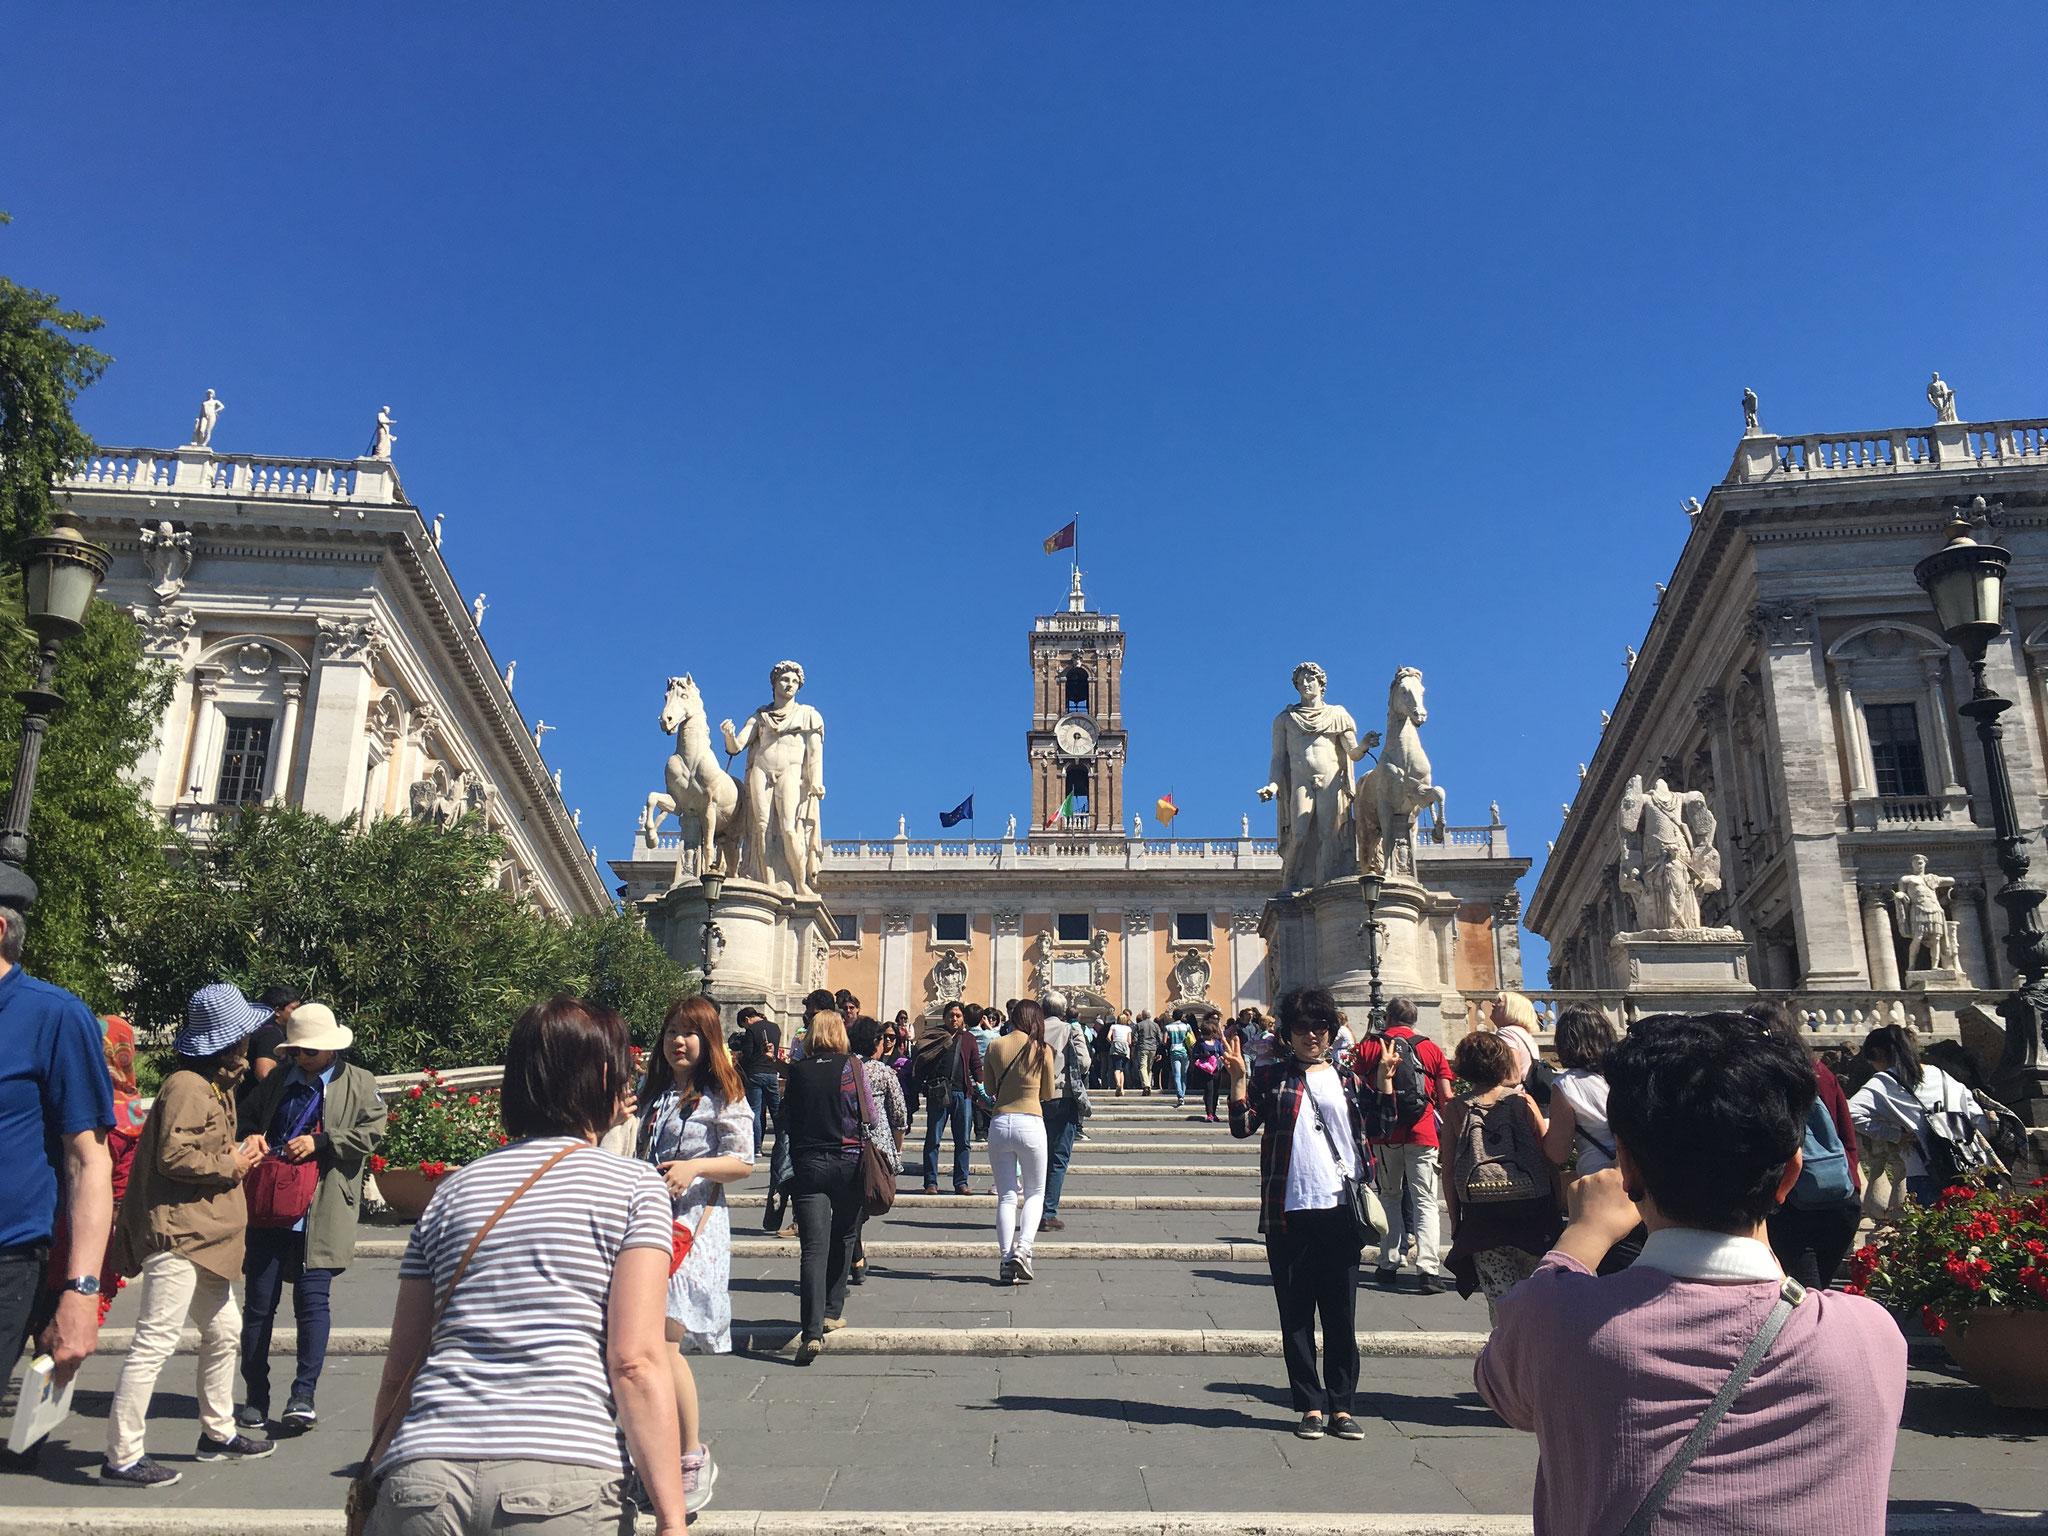 Treppenaufgang zum Piazza del Campidoglio